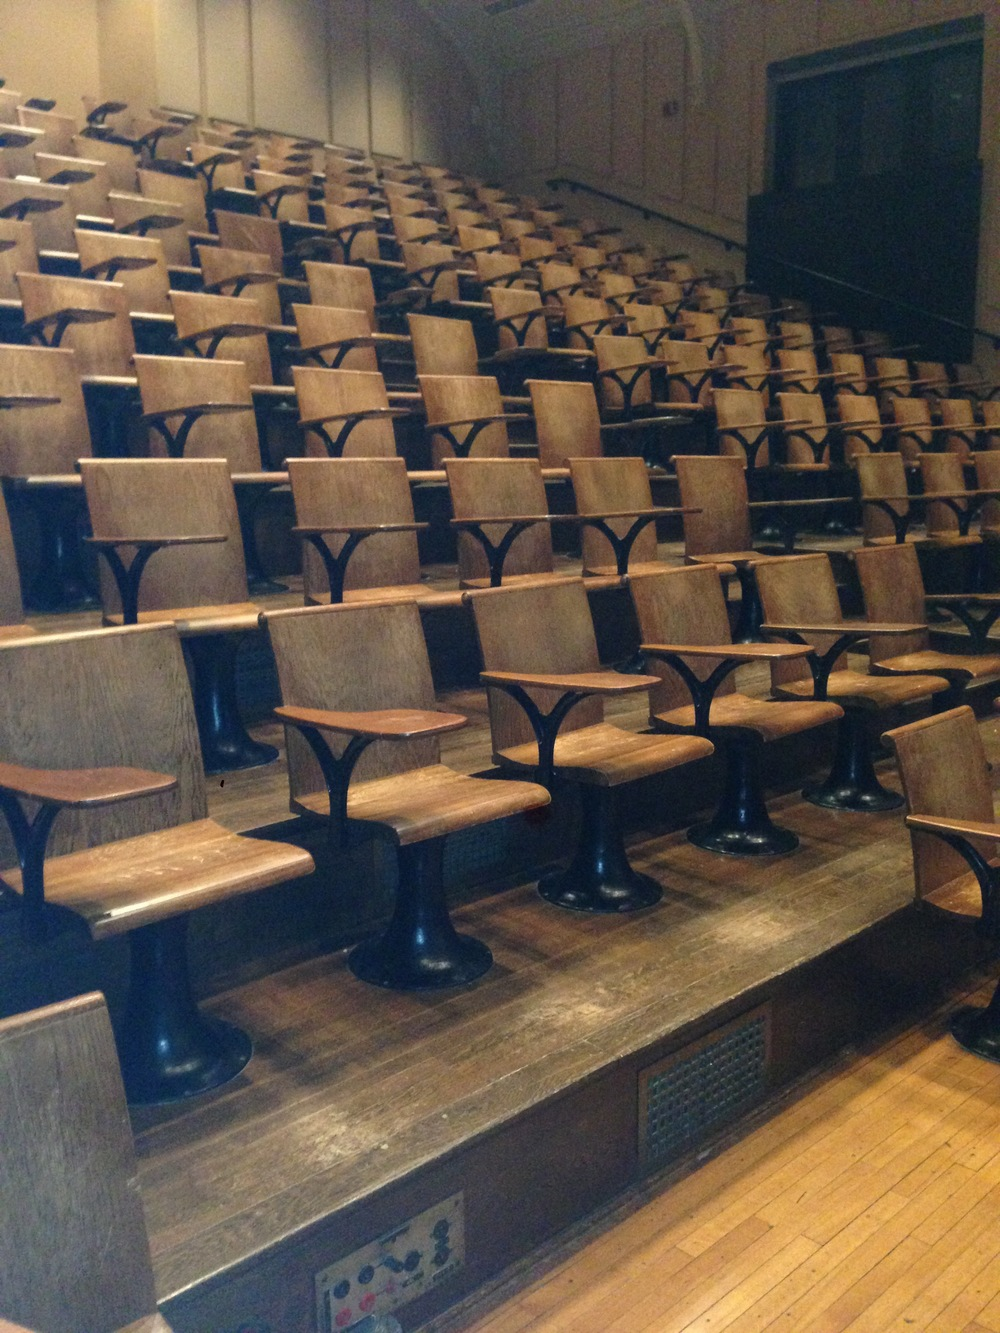 Albert Einstein's Class Room